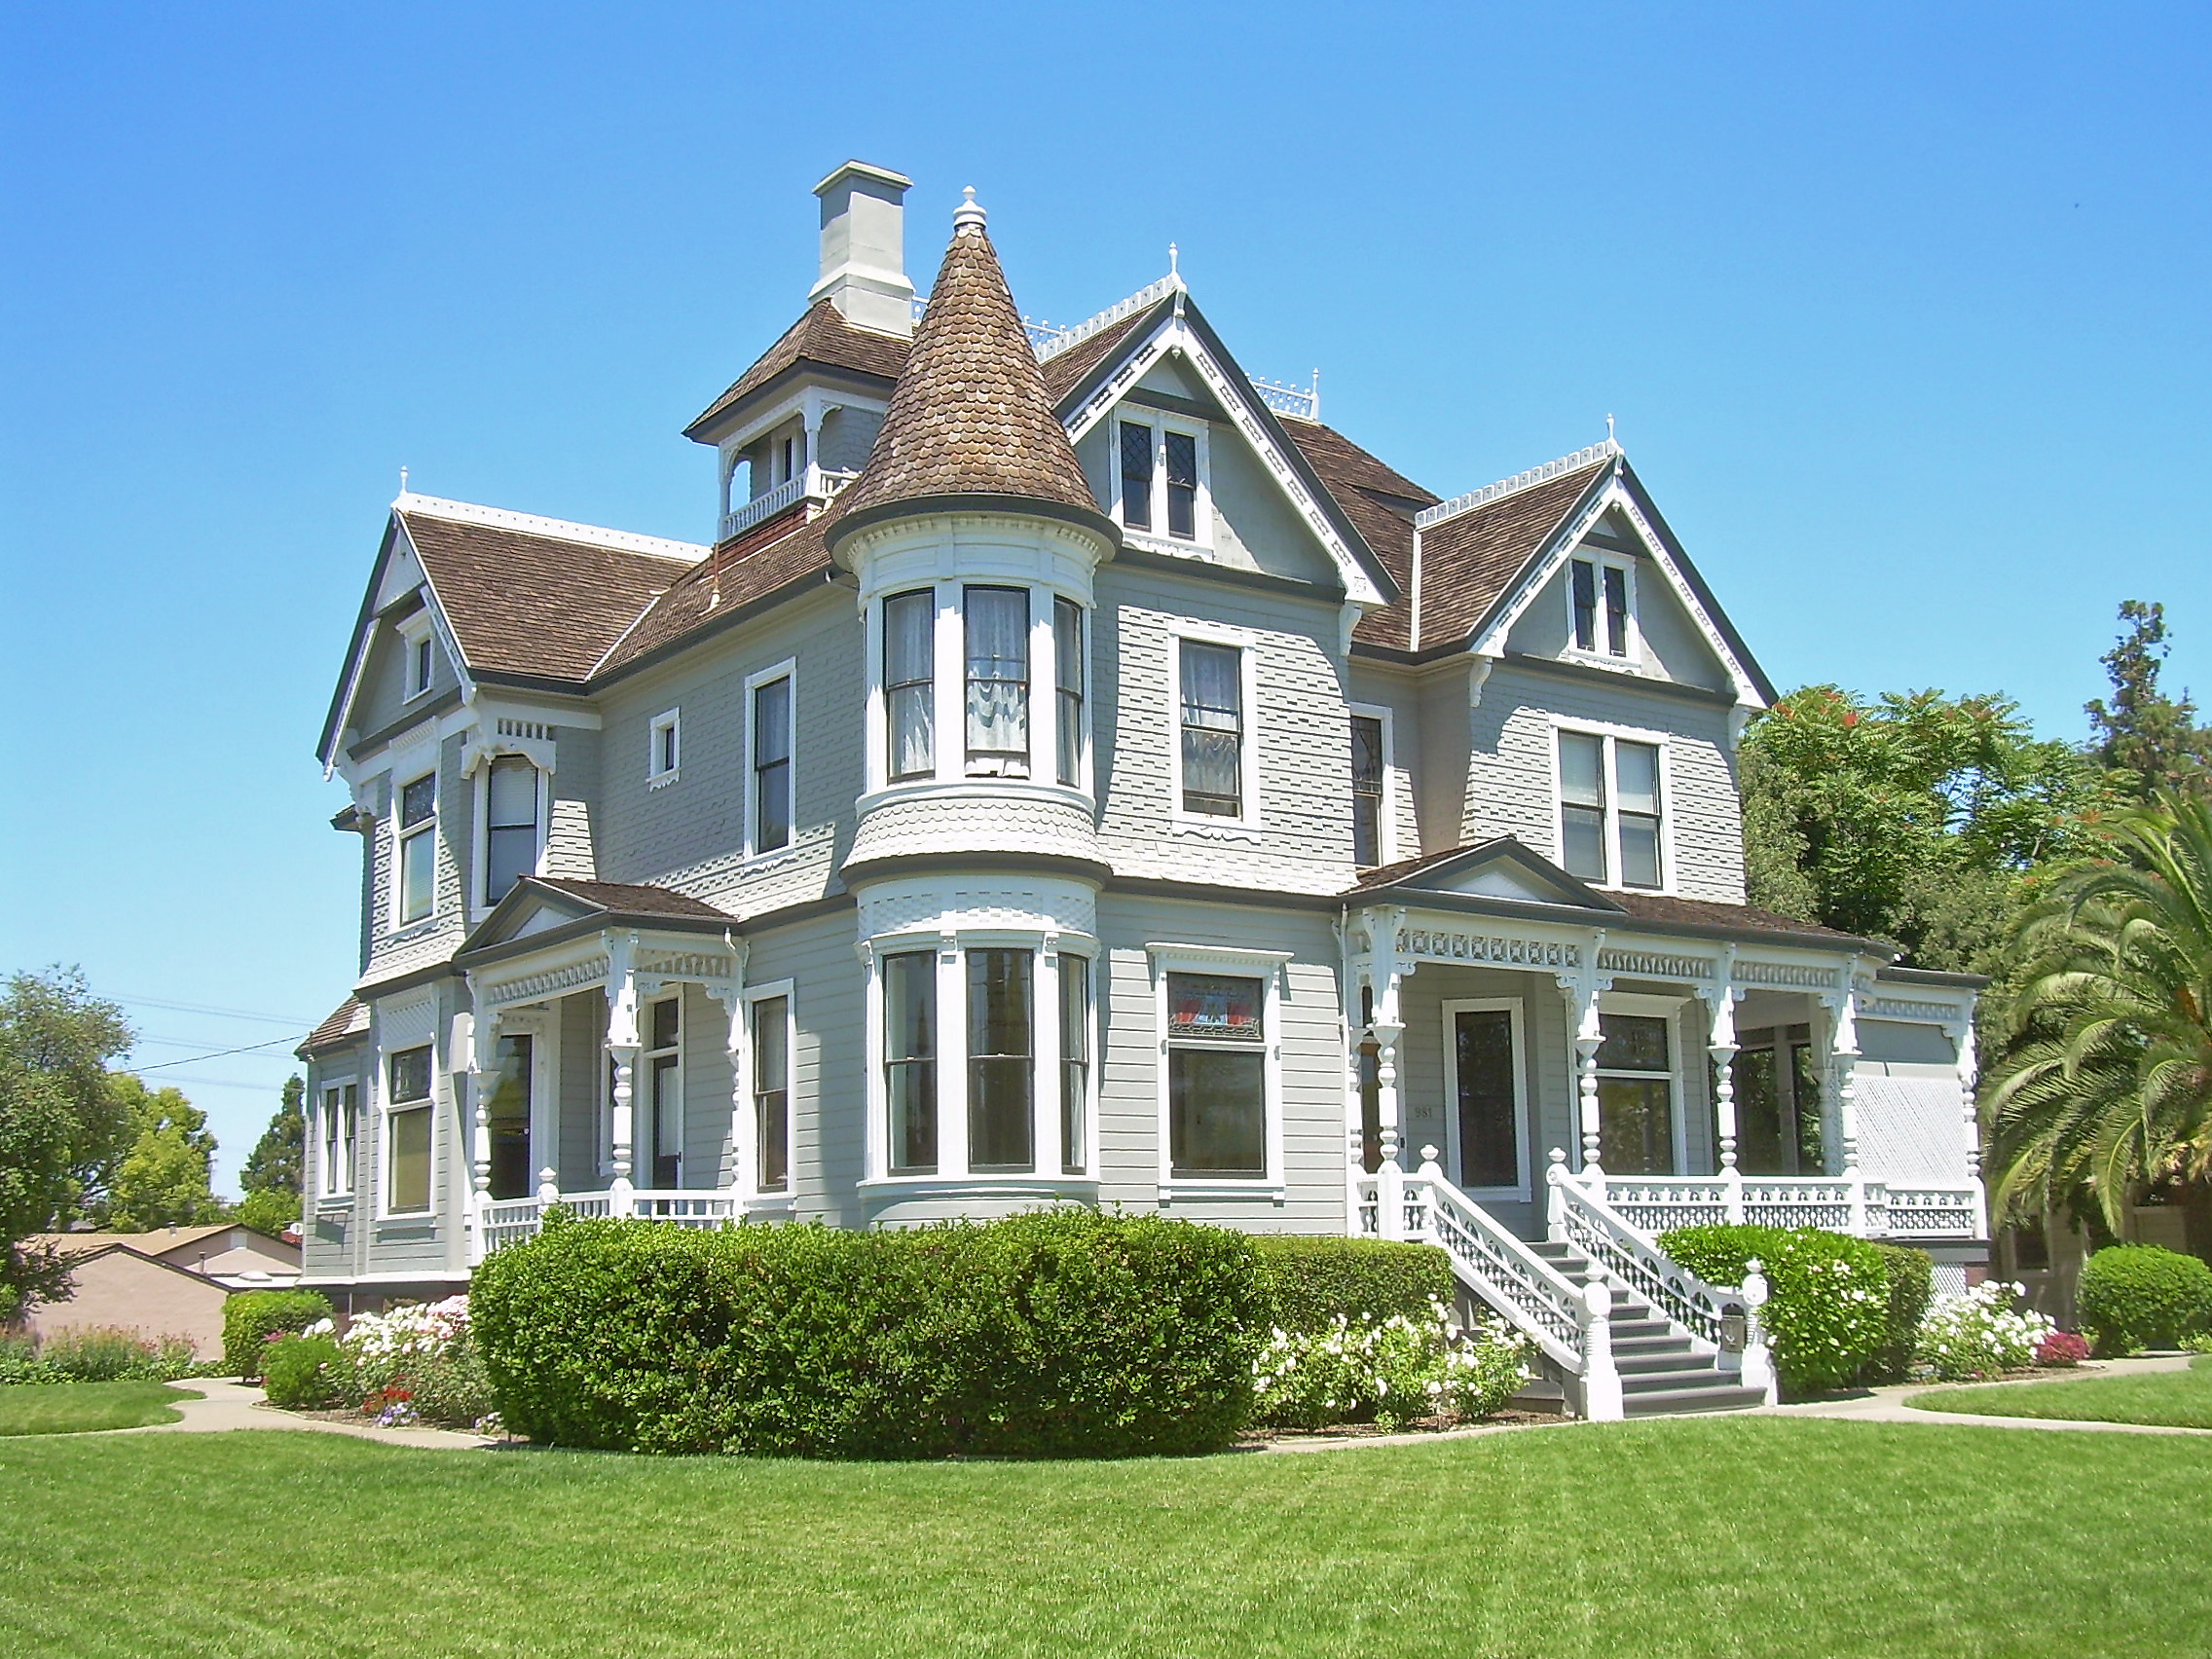 Victorian Architecture In The United States Wikipedia